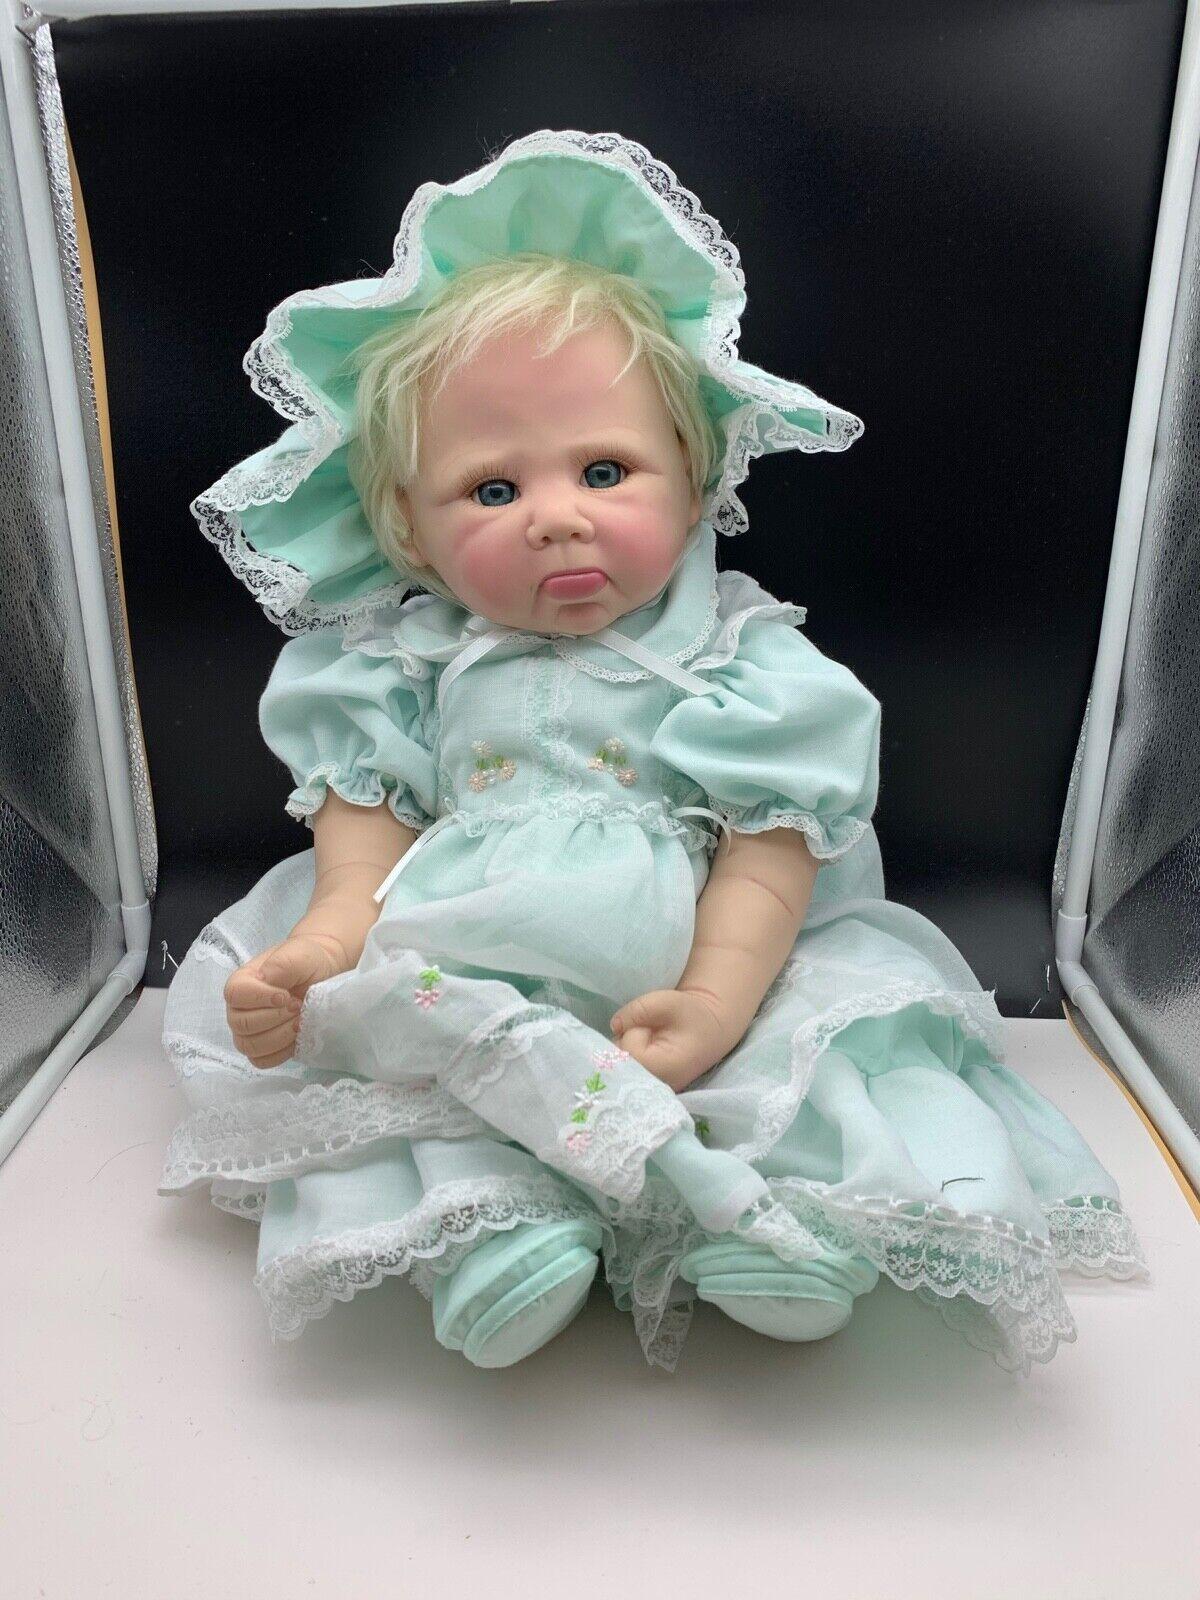 Artistic Doll Vinyl Doll 57 Cm. Top Zustand